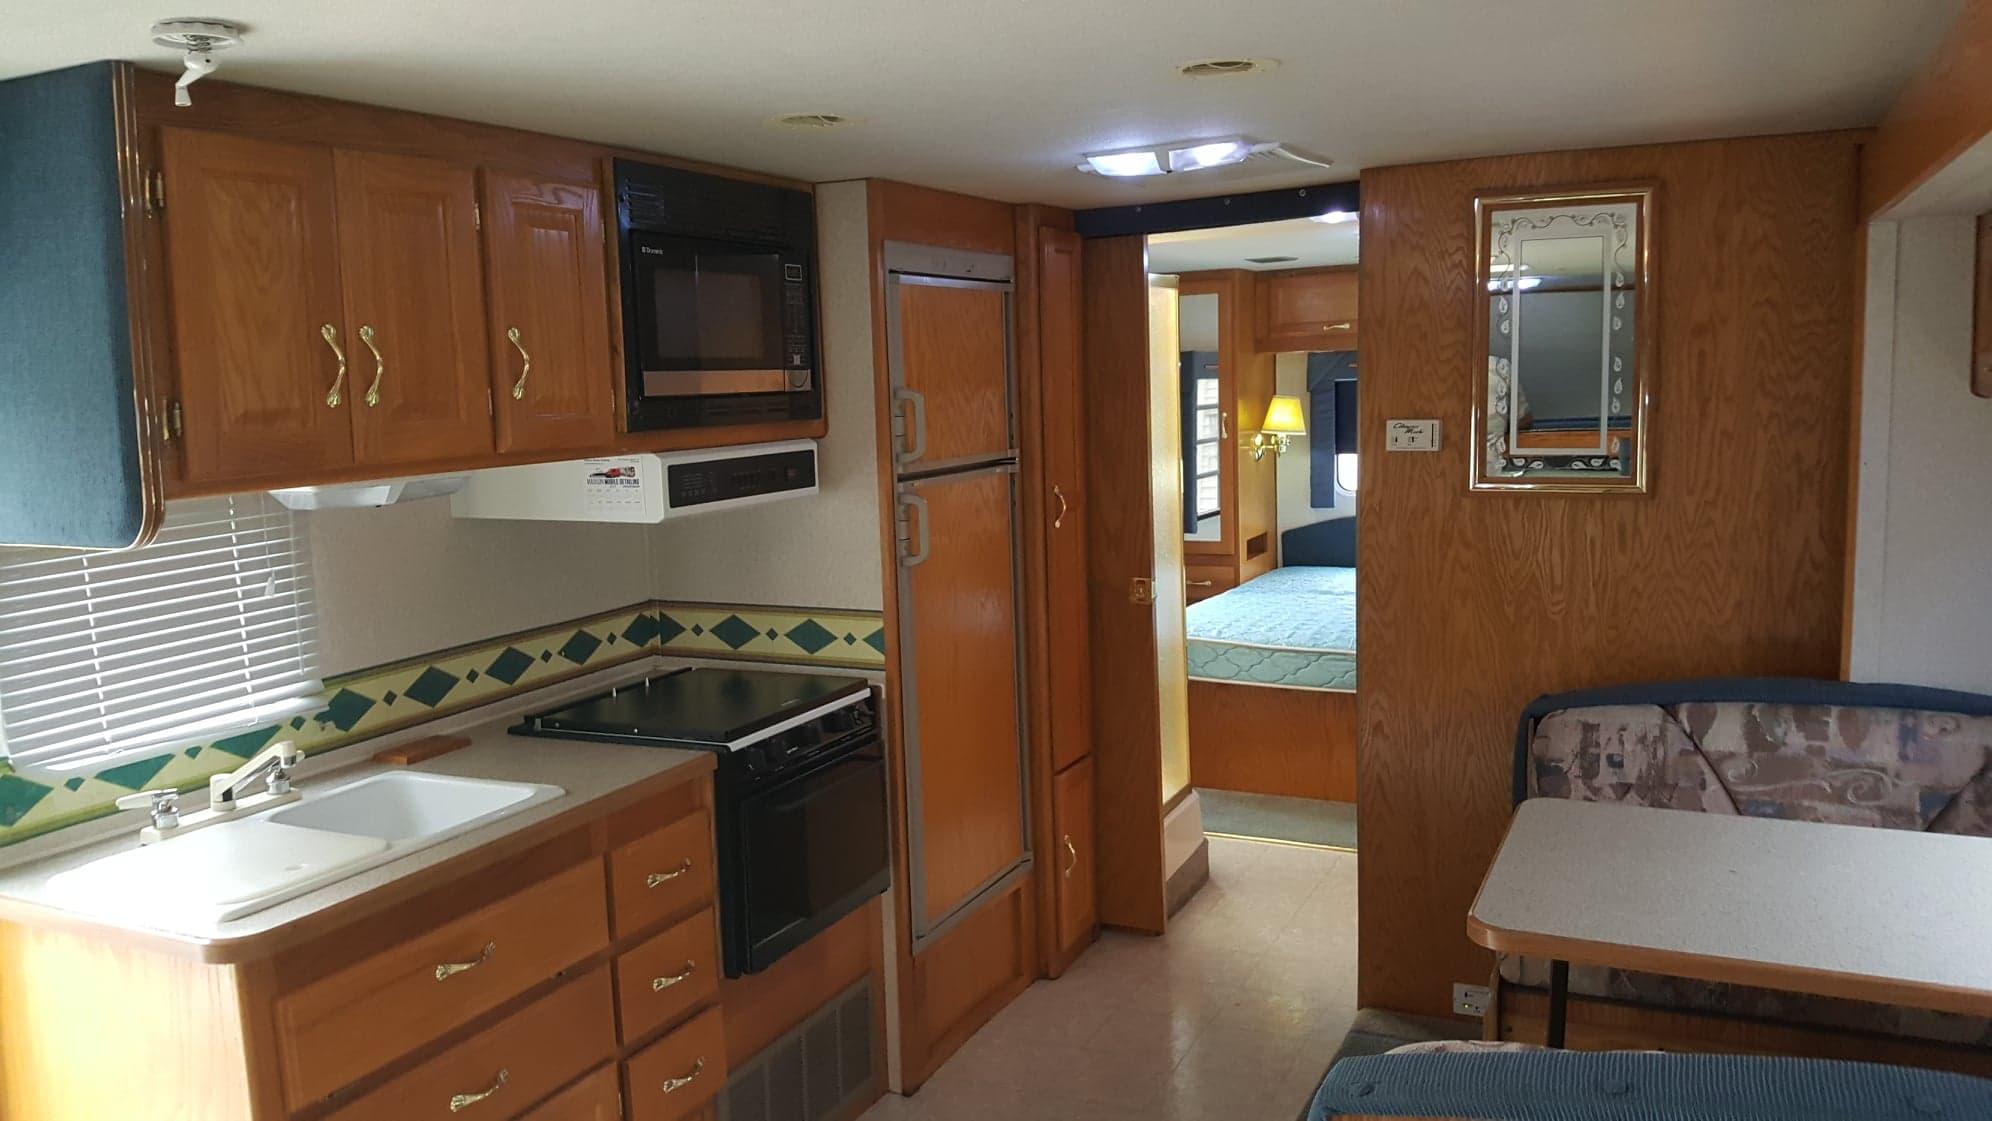 Kitchen area with nice size fridge.  . Gulf Stream Yellowstone 2000